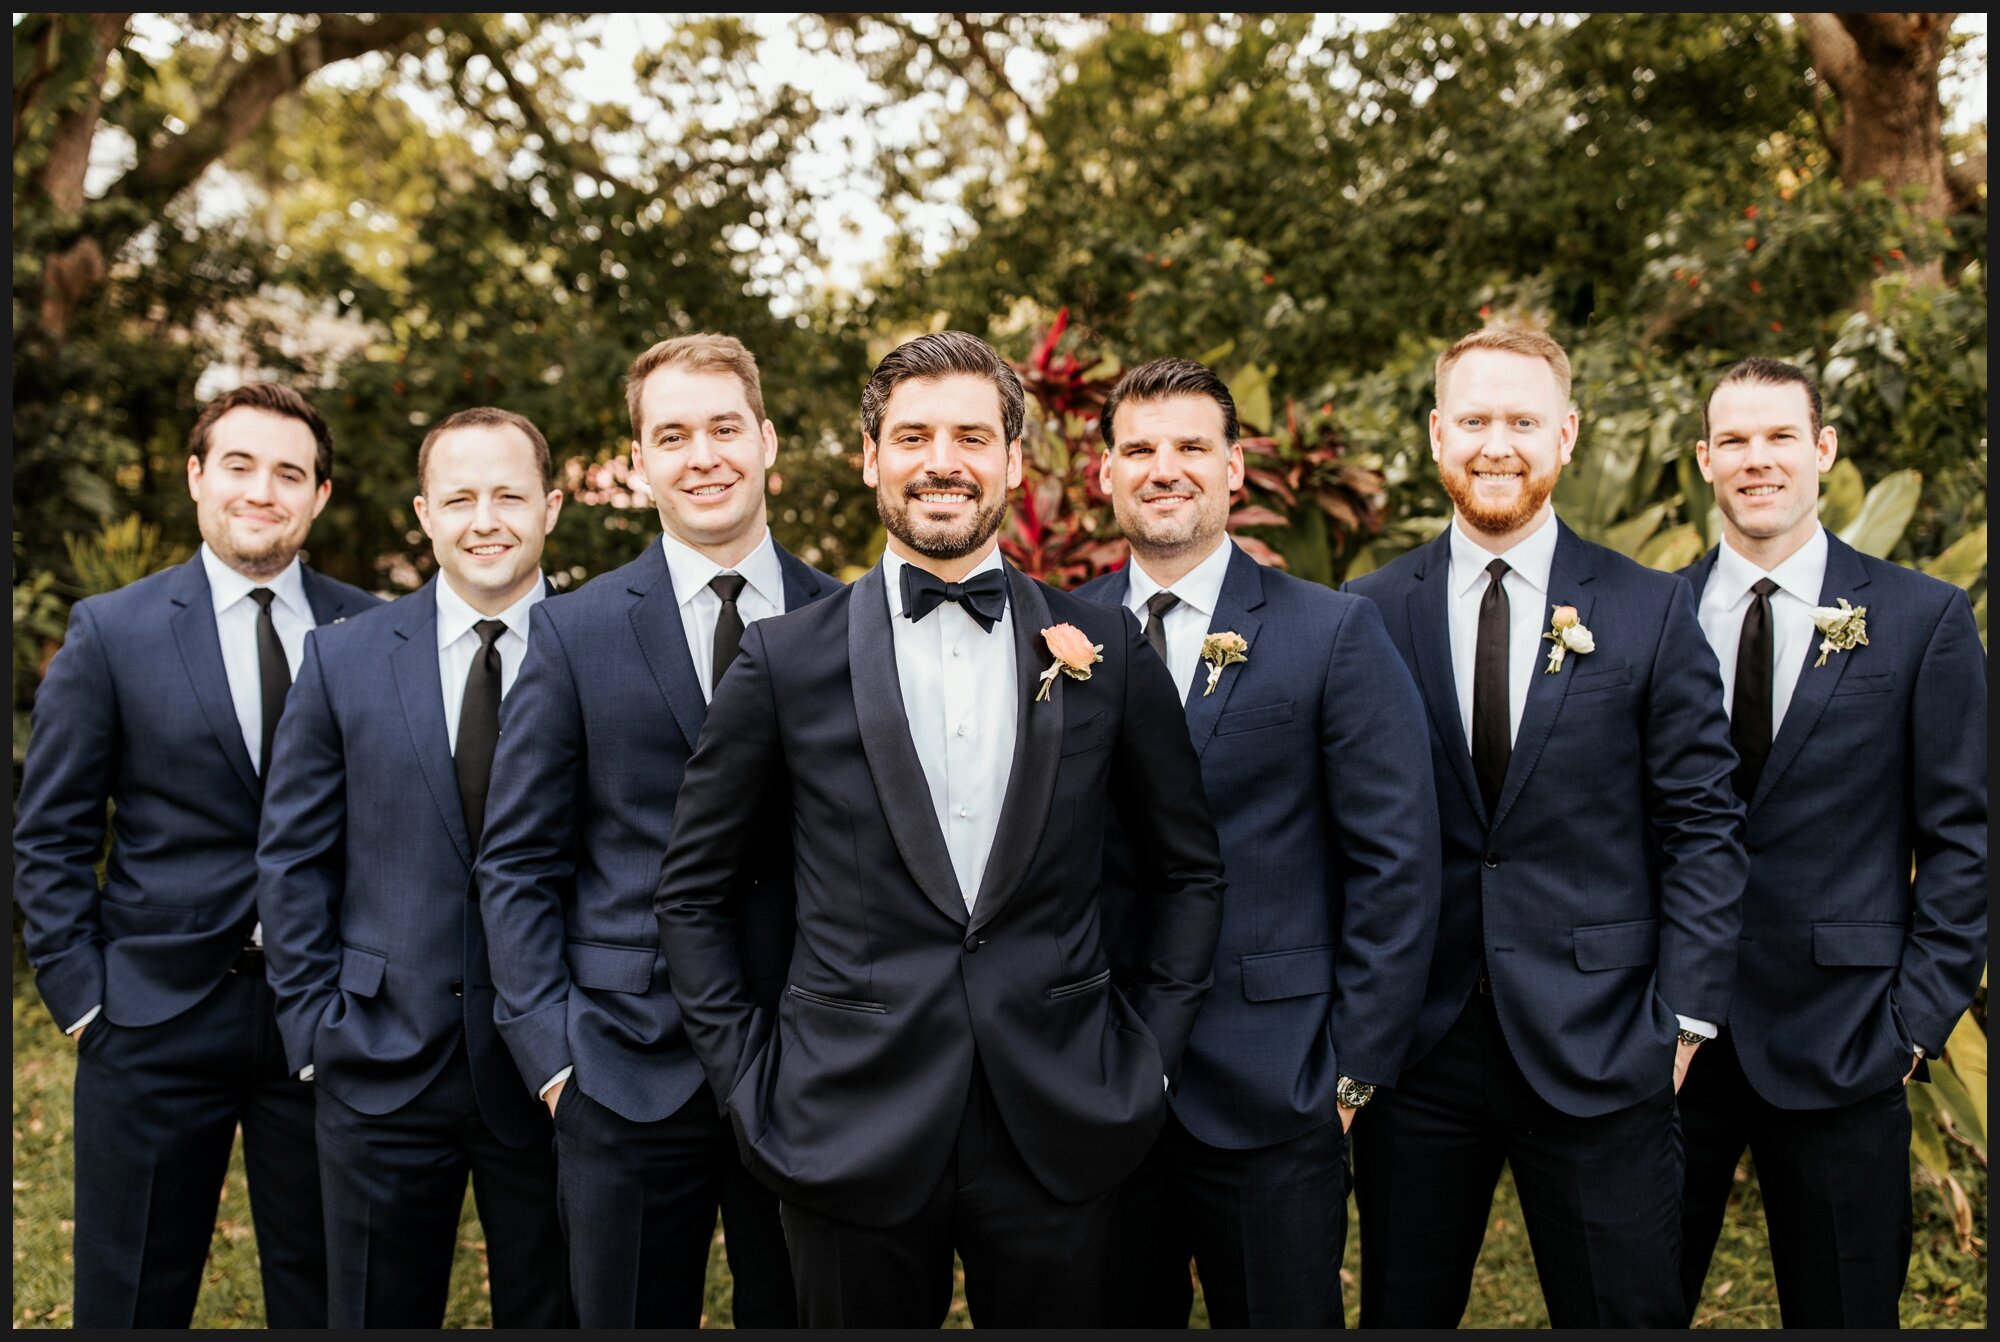 Orlando-Wedding-Photographer-destination-wedding-photographer-florida-wedding-photographer-hawaii-wedding-photographer_0746.jpg